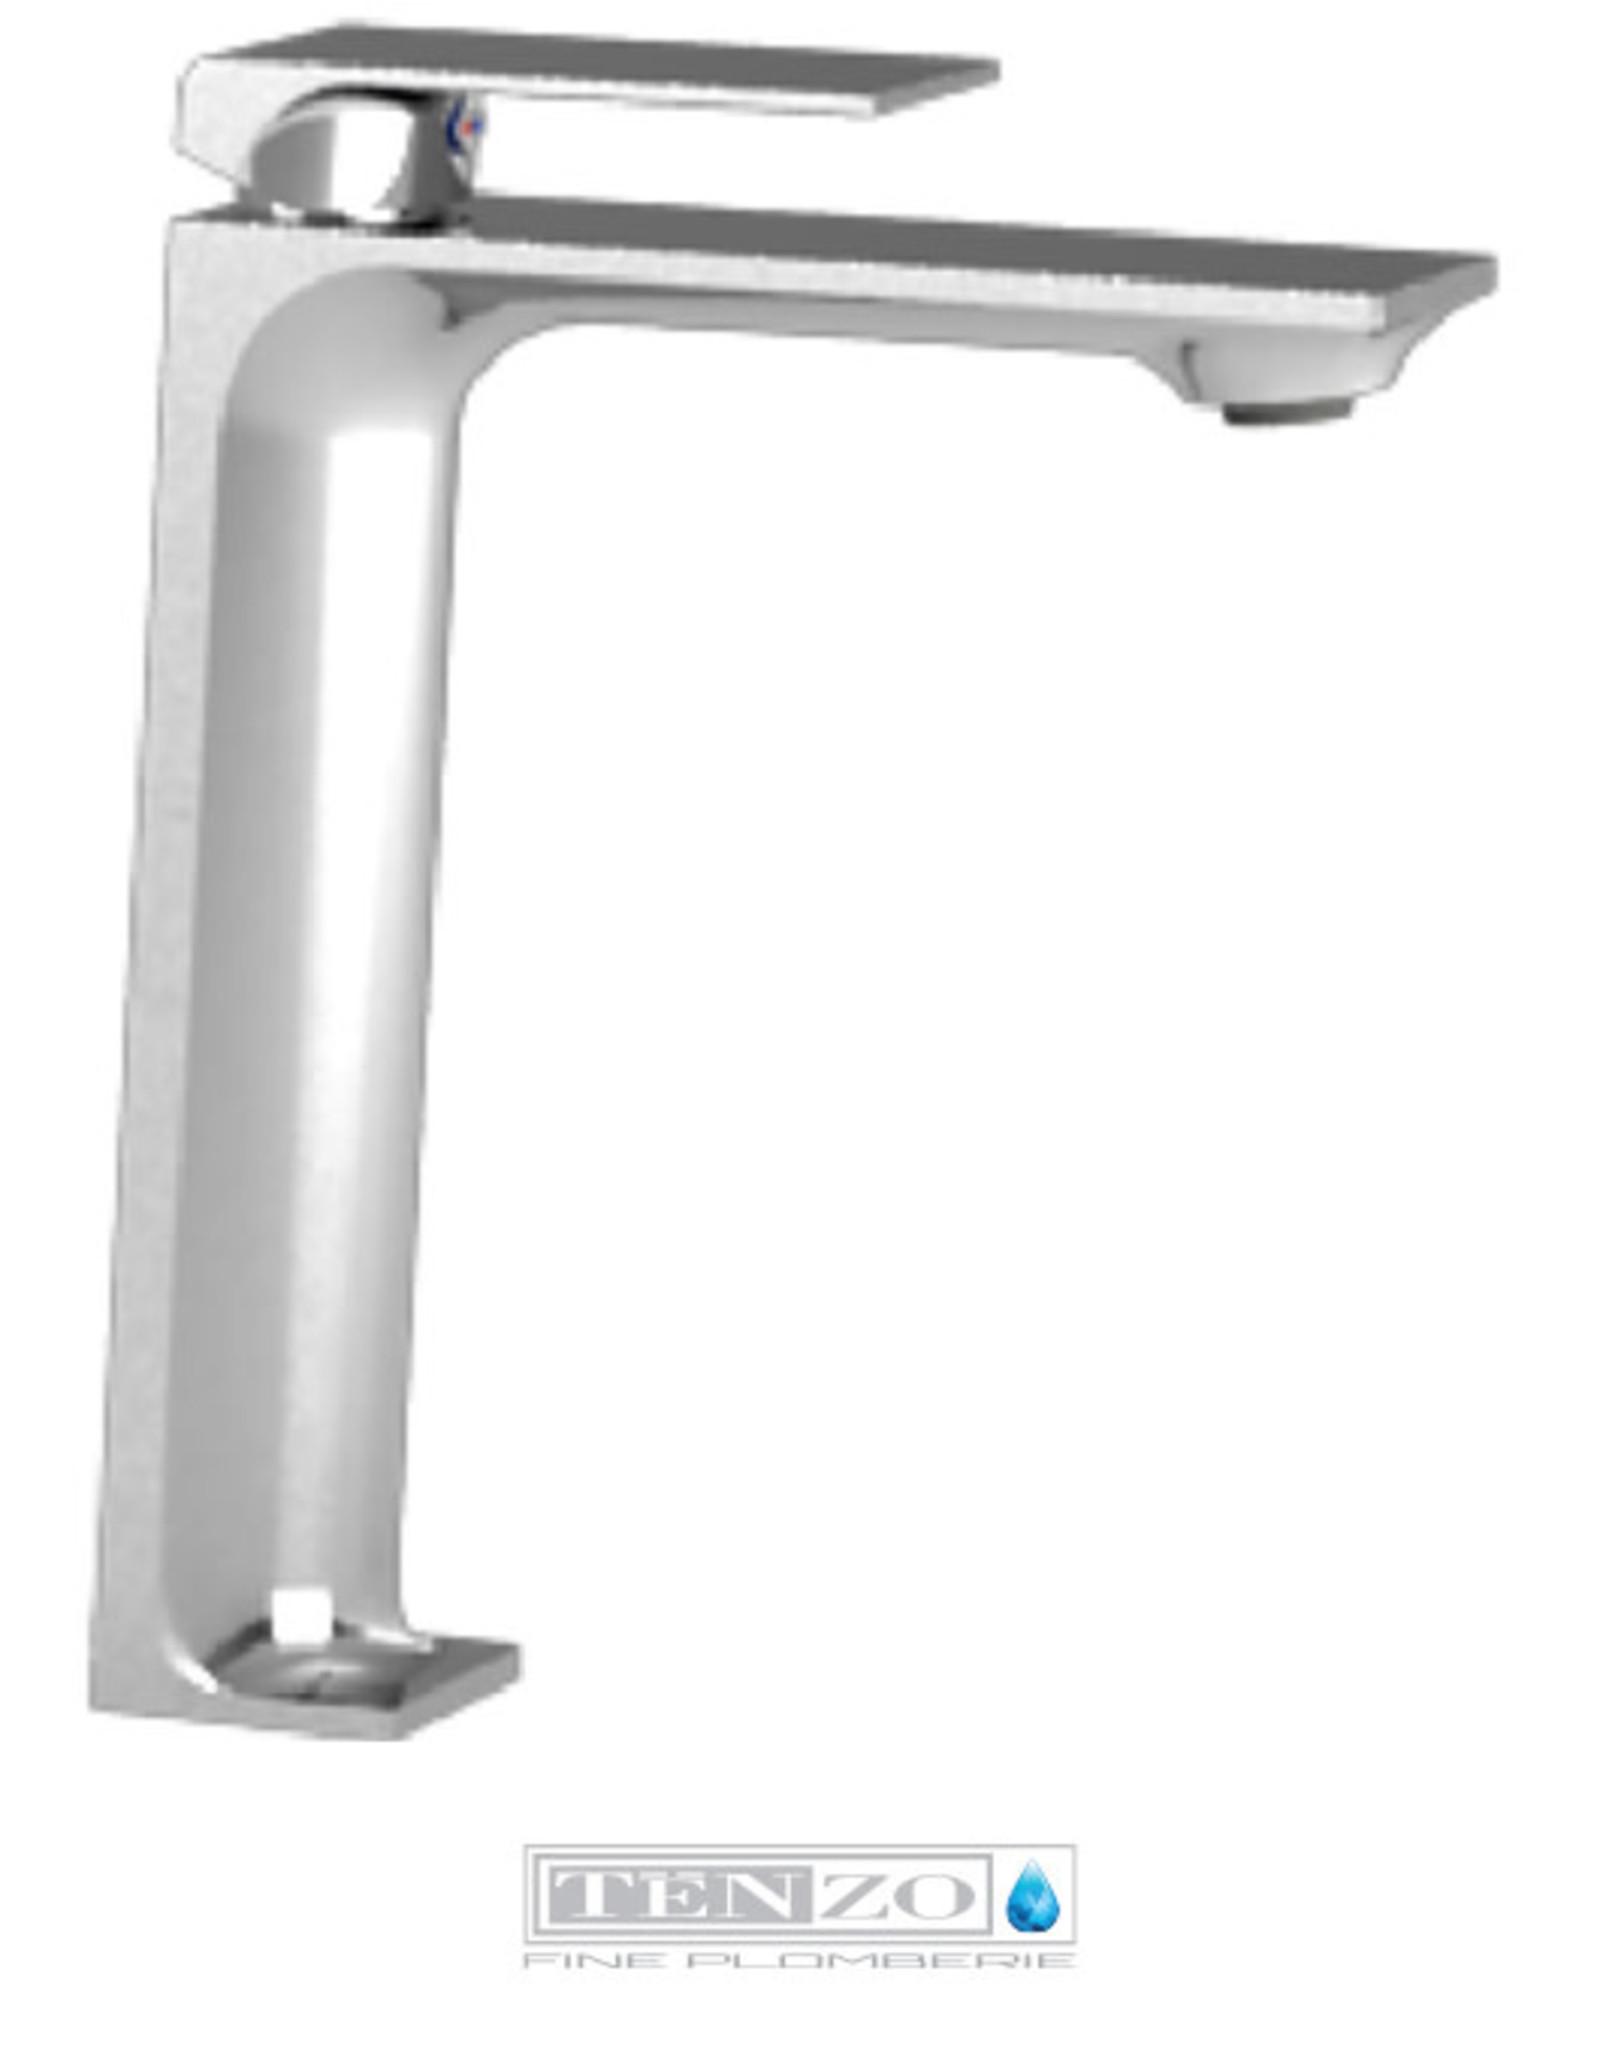 Tenzo Tenzo Slik Vessel Faucet Chrome w/ Drain (No Overflow)